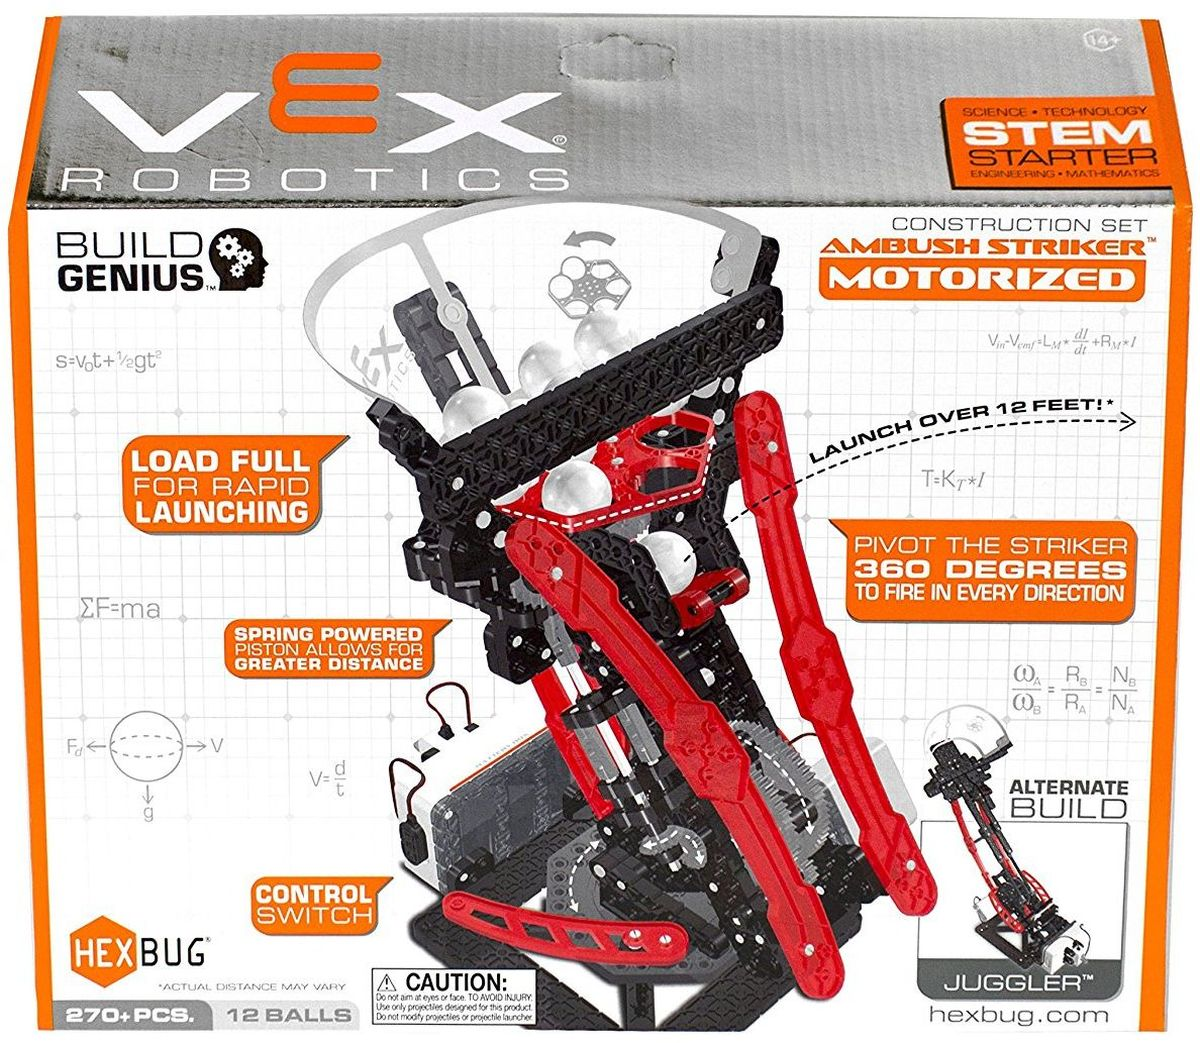 Hexbug Конструктор Vex Ambush Striker hexbug конструктор vex crossbow launcher